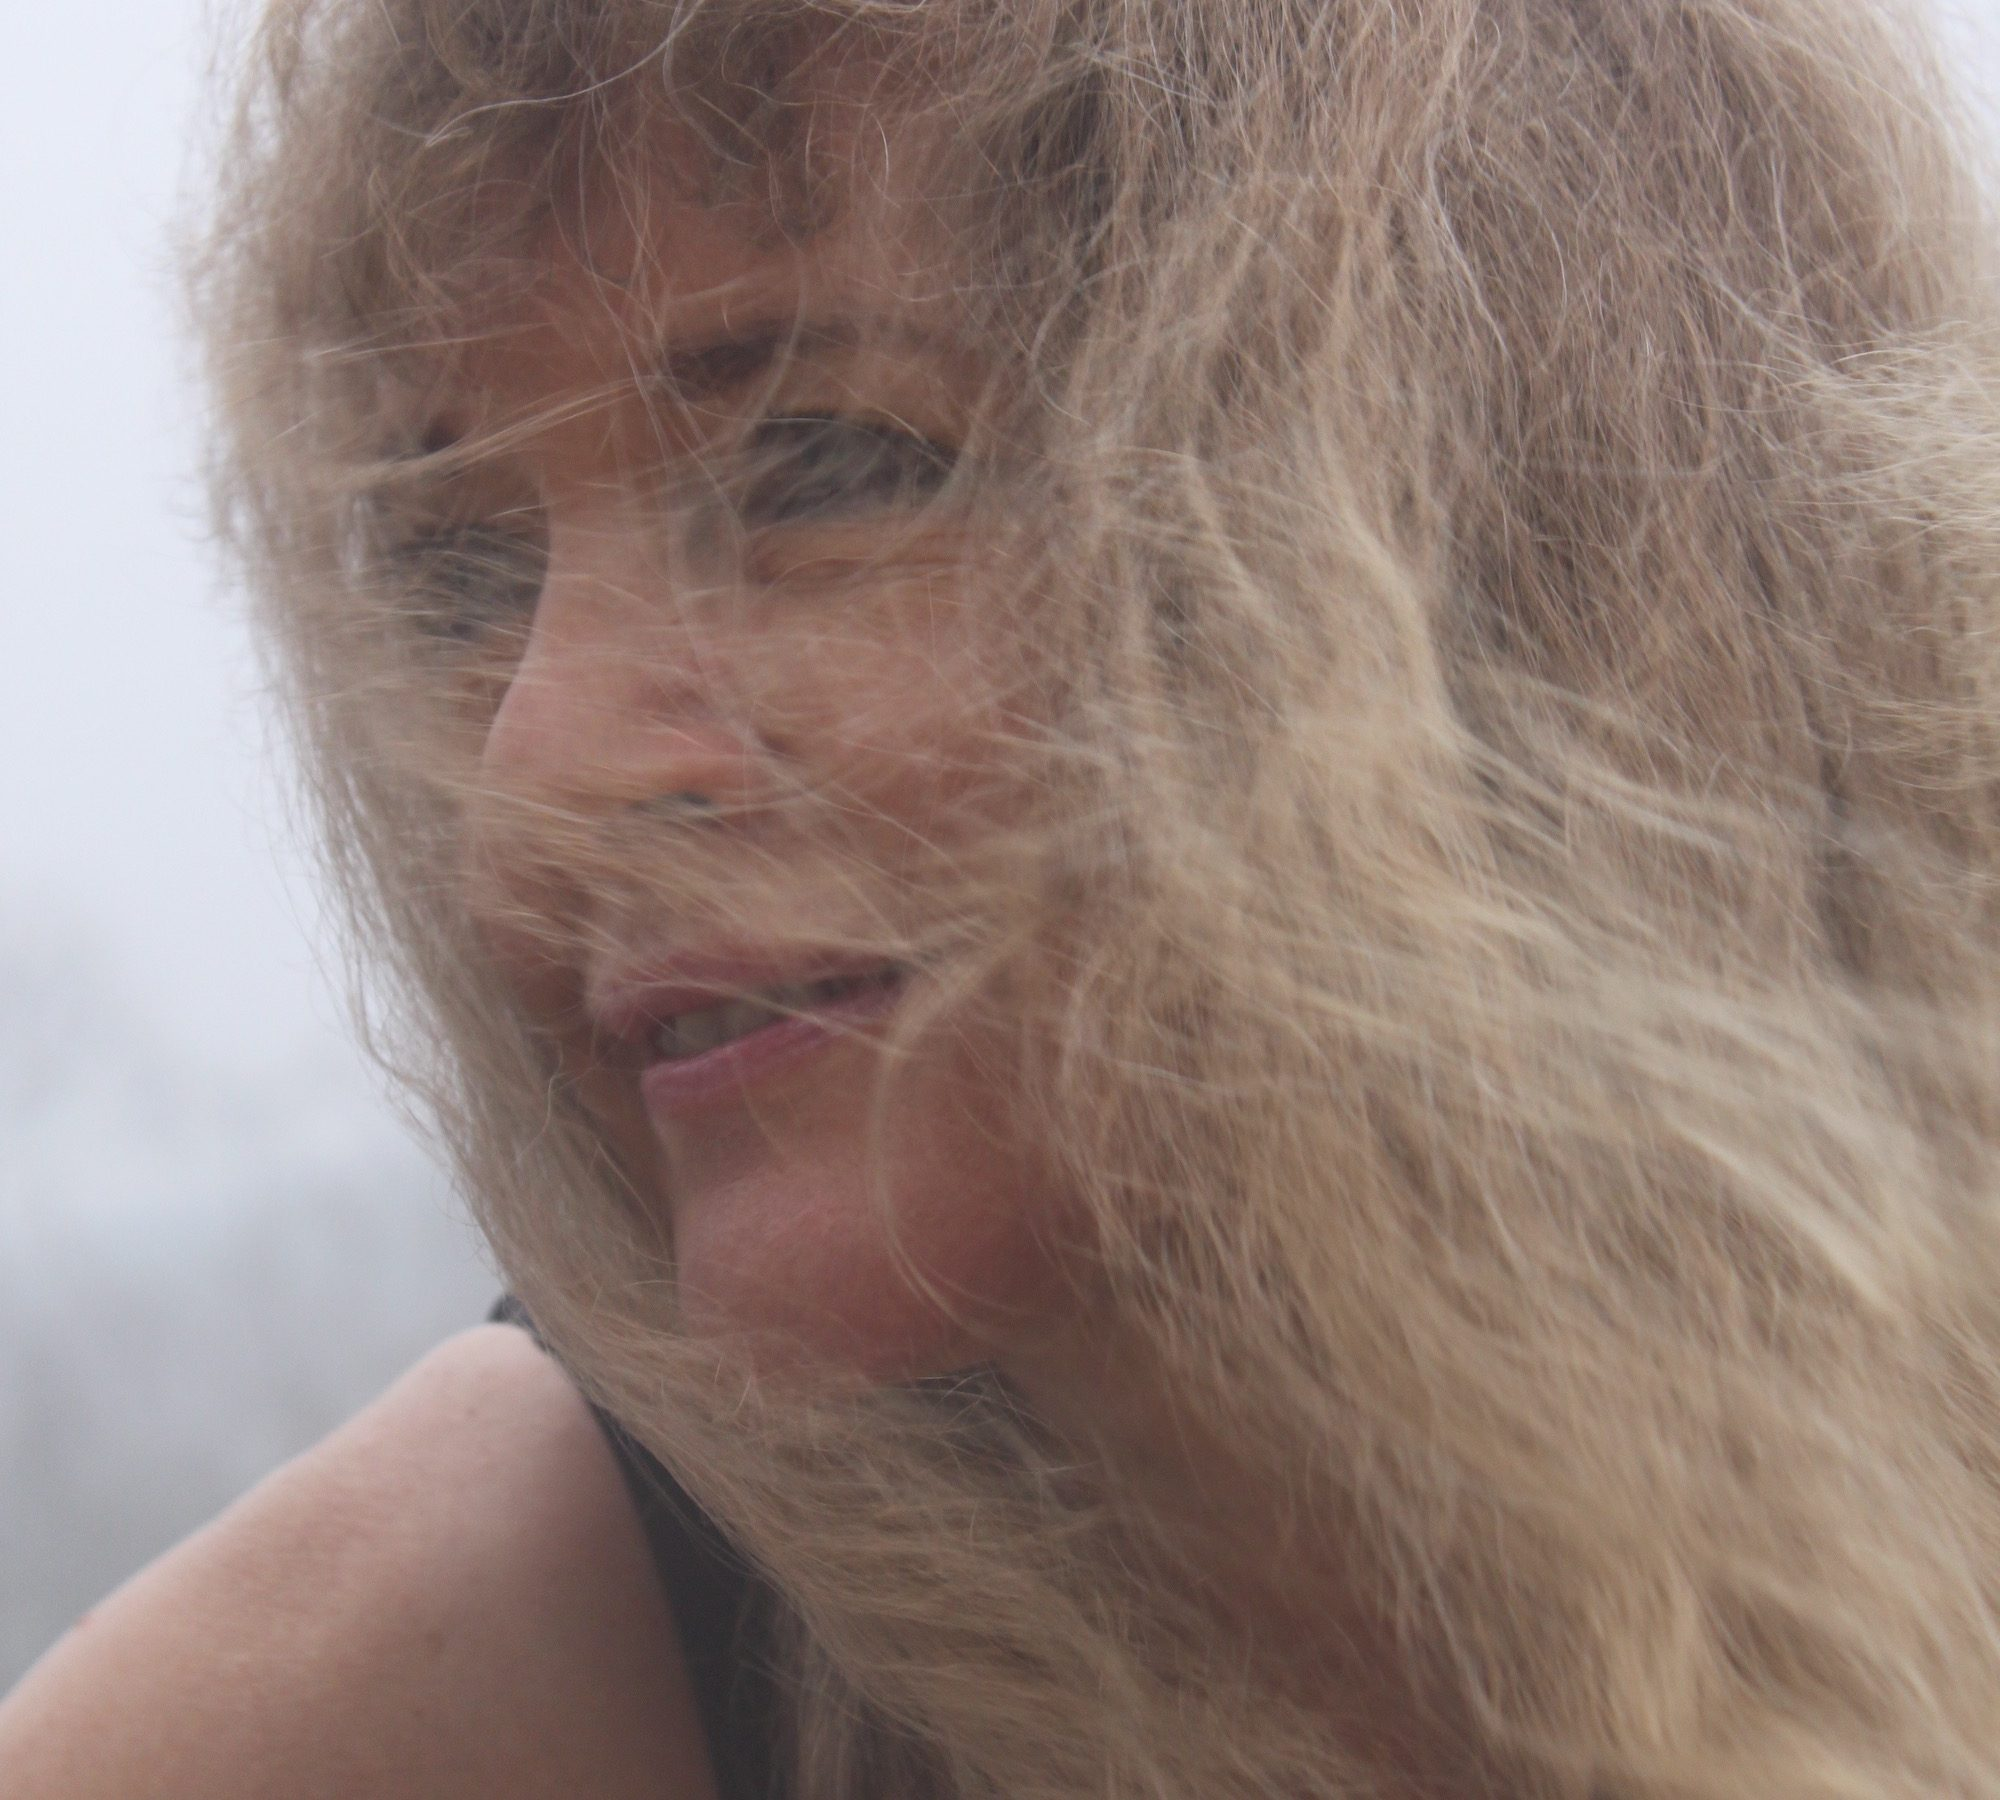 Marion Schneider, Linda Troeller